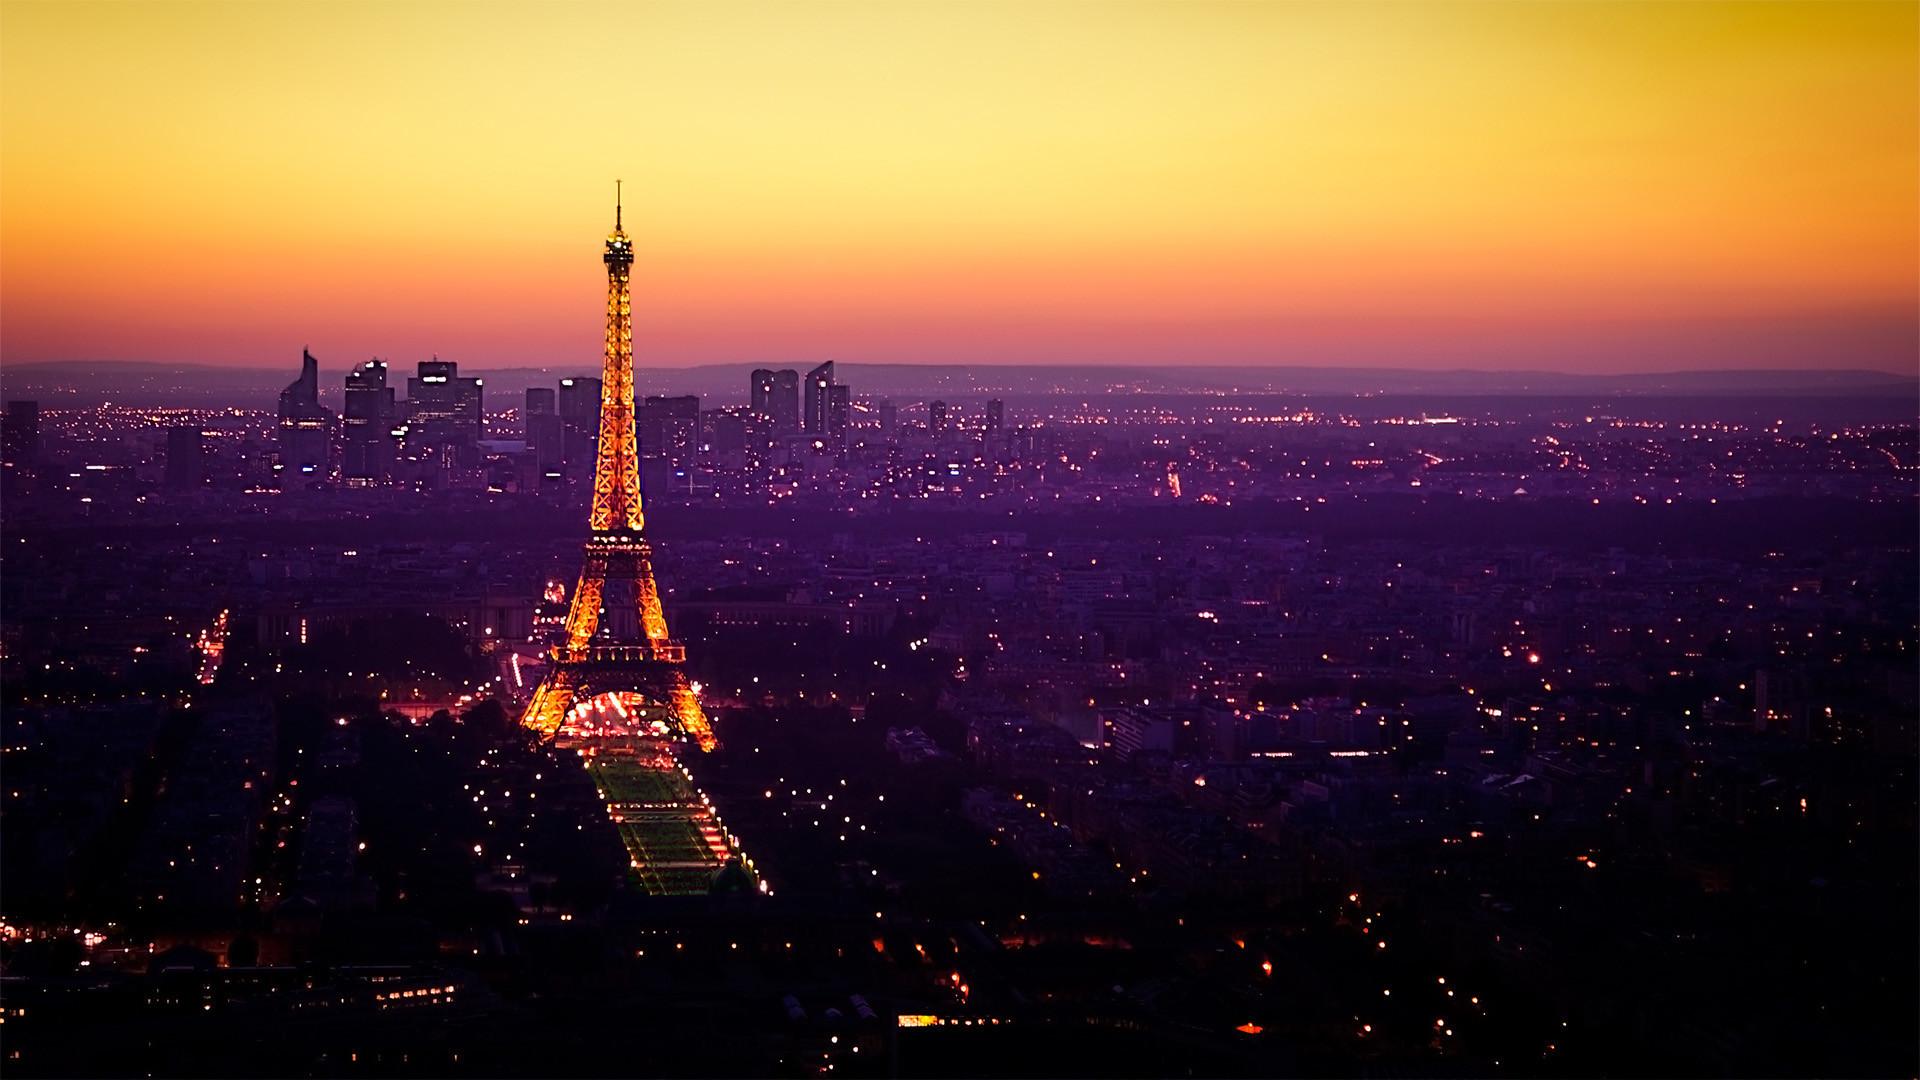 Cute Eiffel Tower Wallpaper: Cute Paris Wallpaper Girly (48+ Images